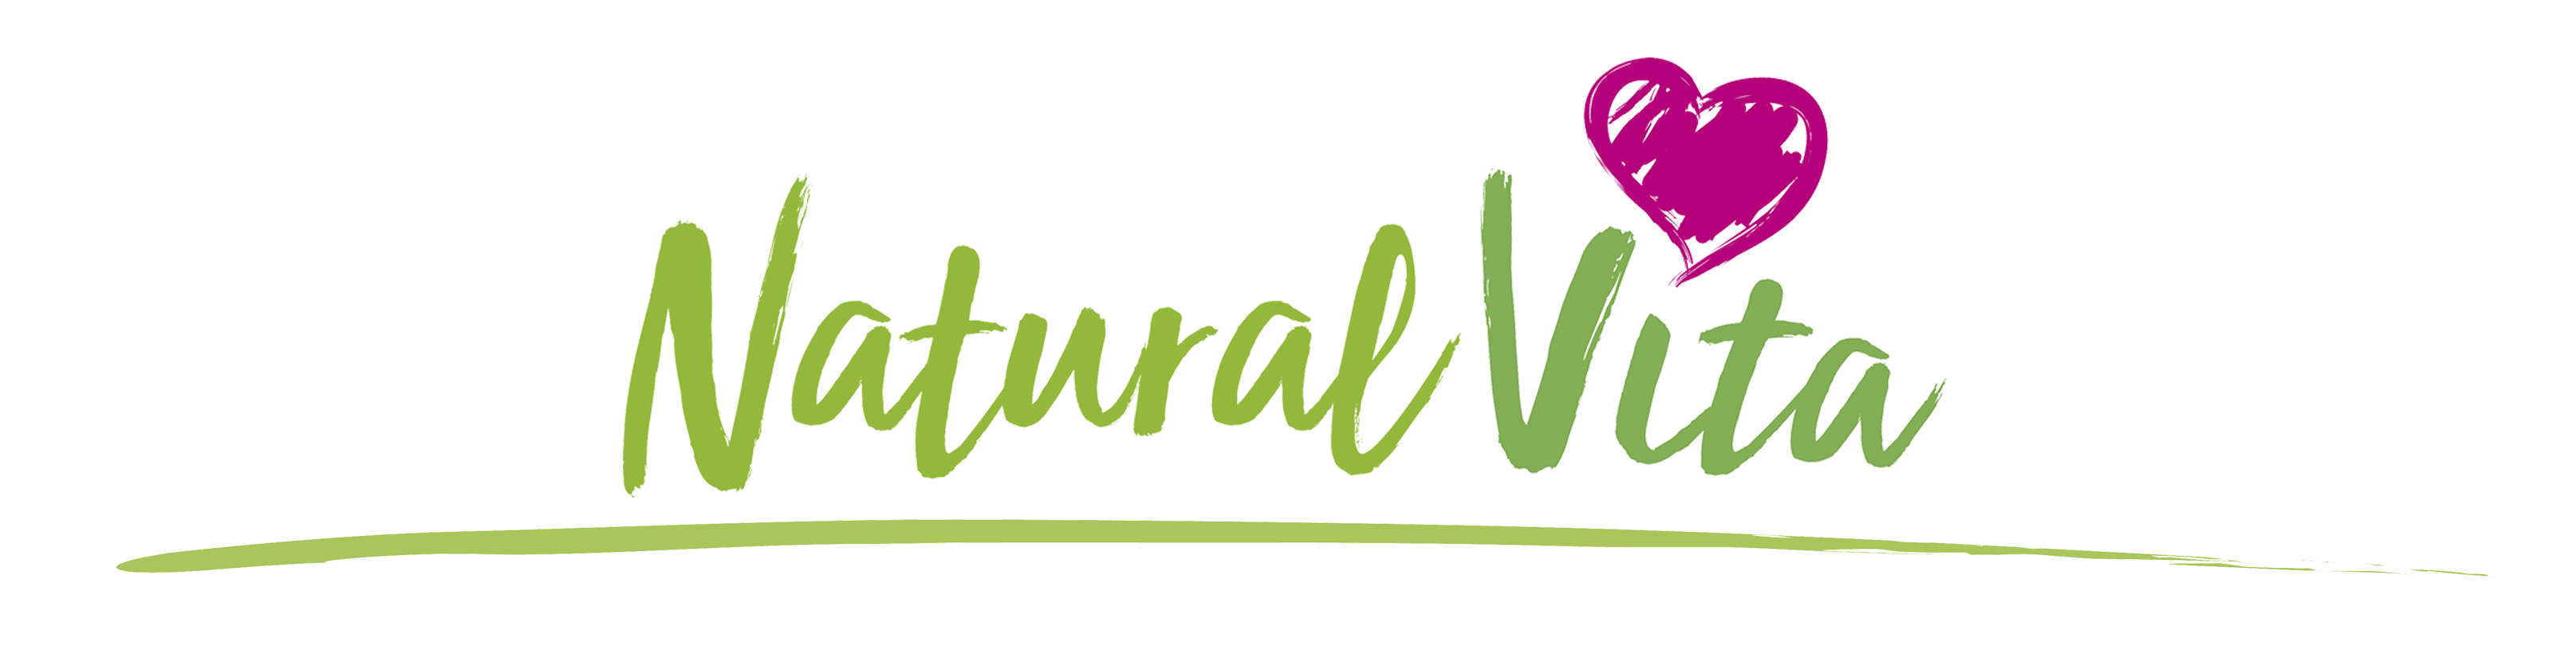 Natural Vita Brasil